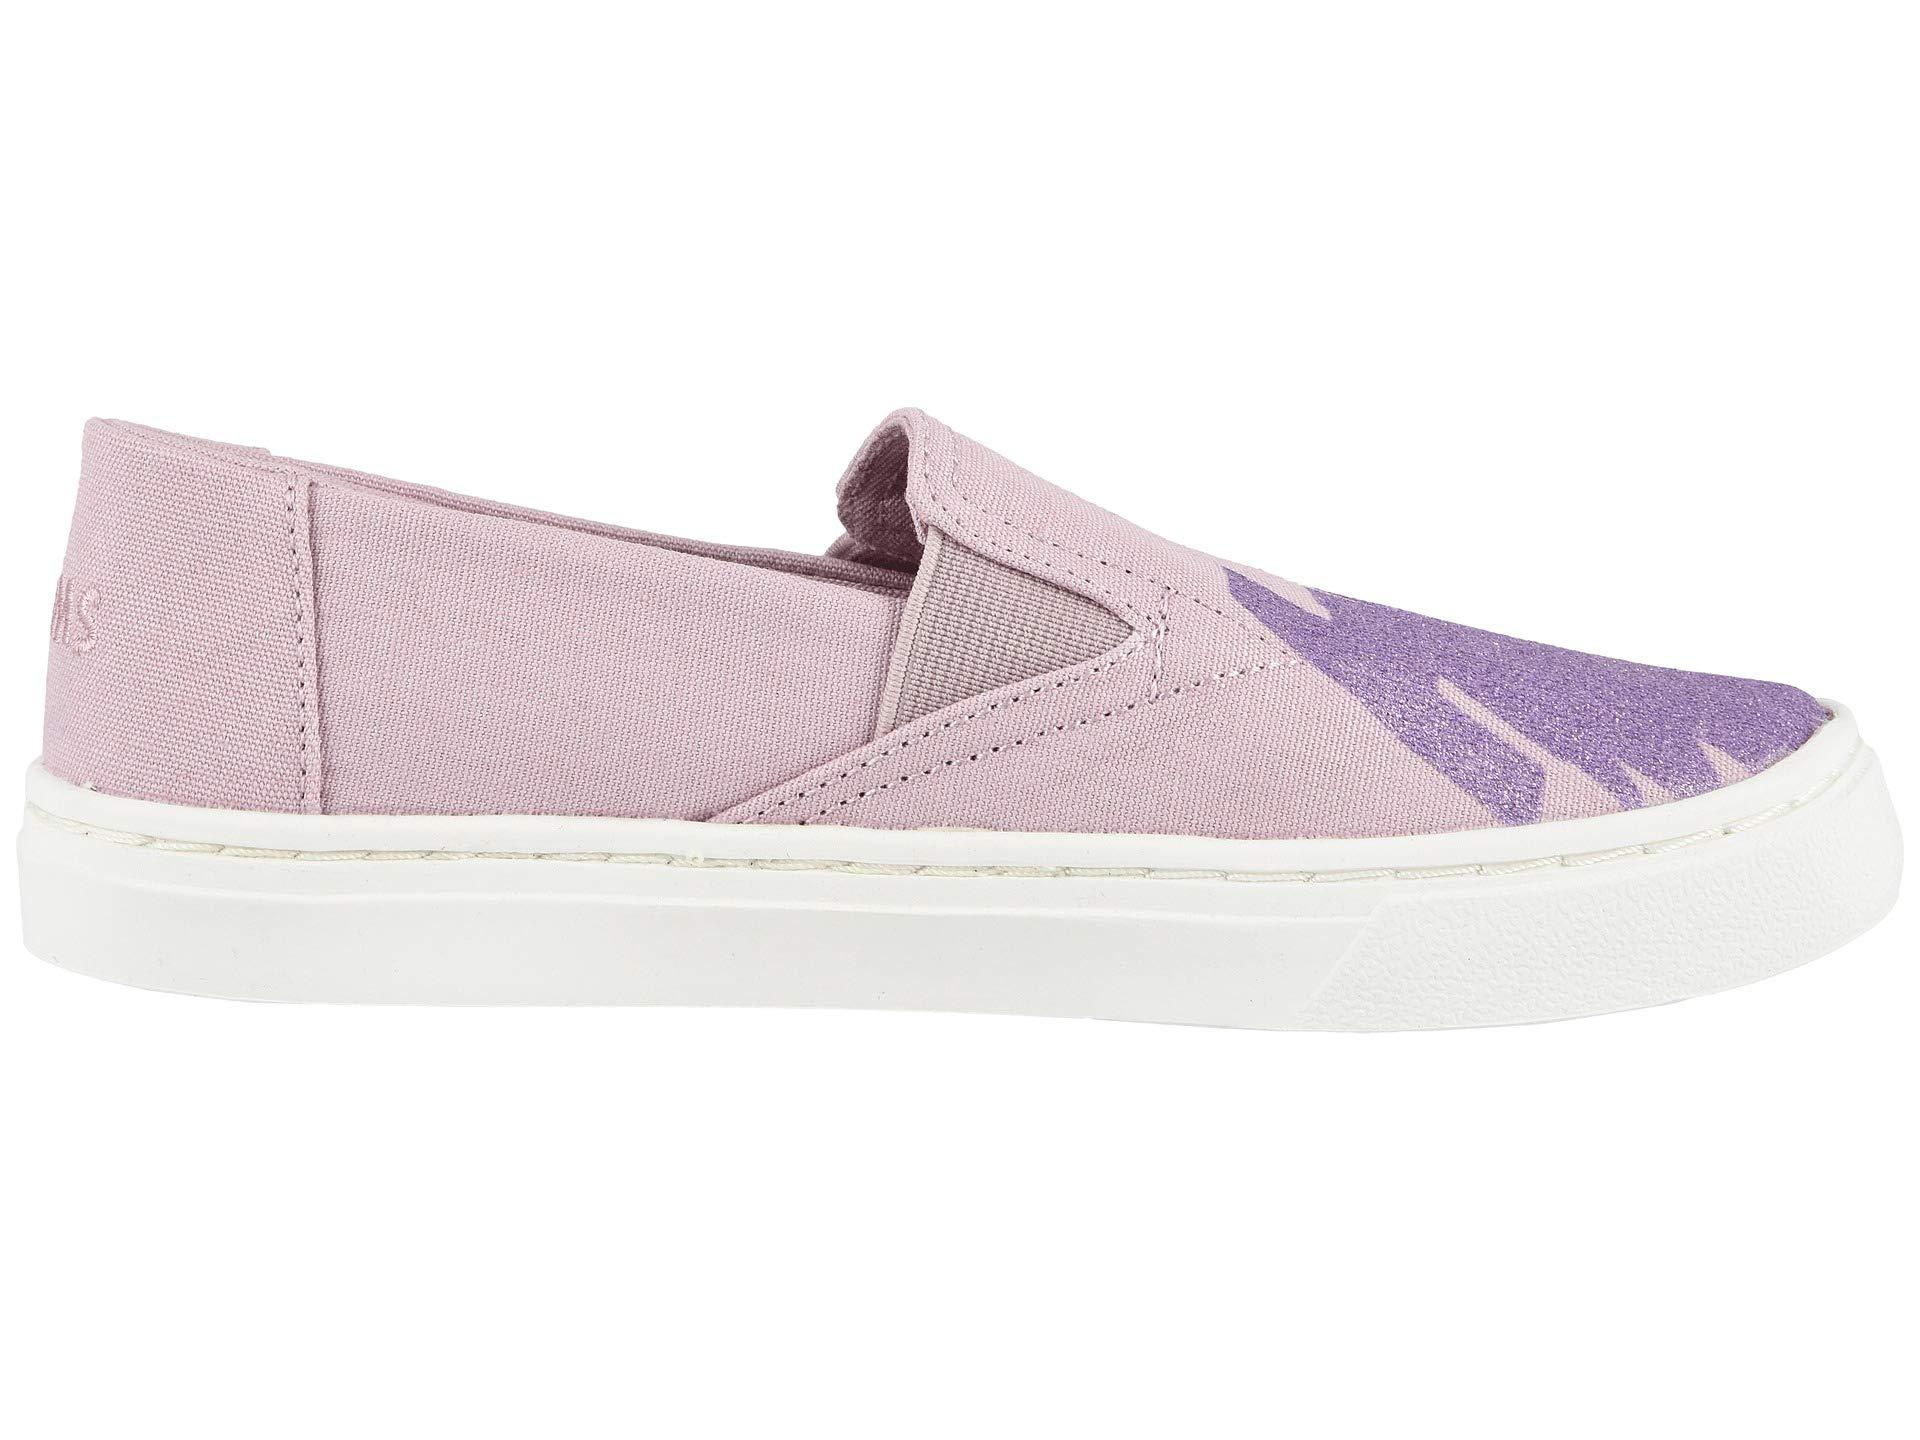 TOMS Youth Luca Slip-On Shoes, Size: 3.5 M US Big Kid, Color: Brnsh Lilac Glt Star by TOMS Kids (Image #8)